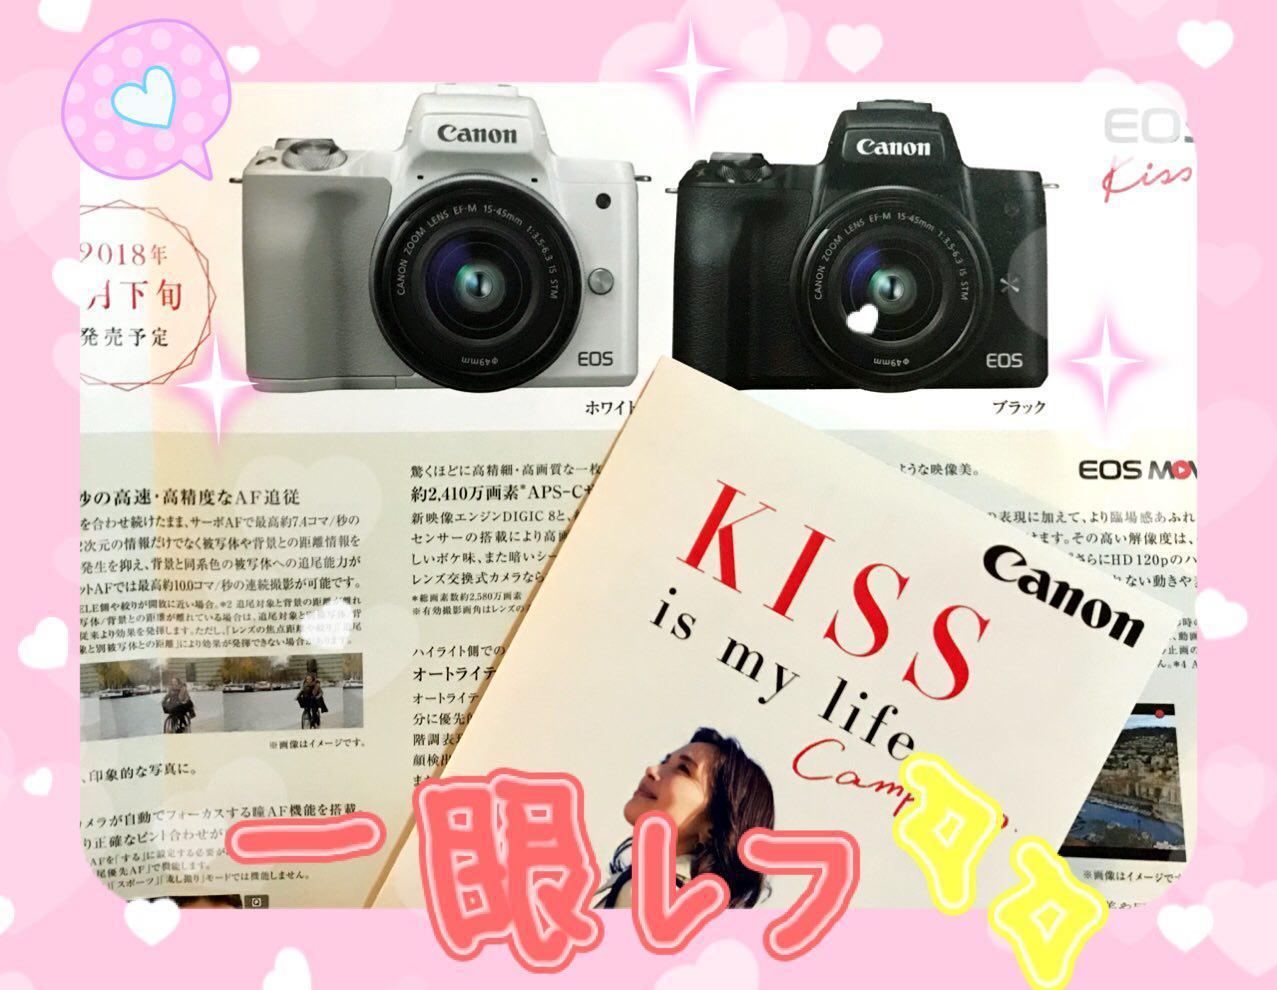 photo_2018-04-19_19-53-24.jpg